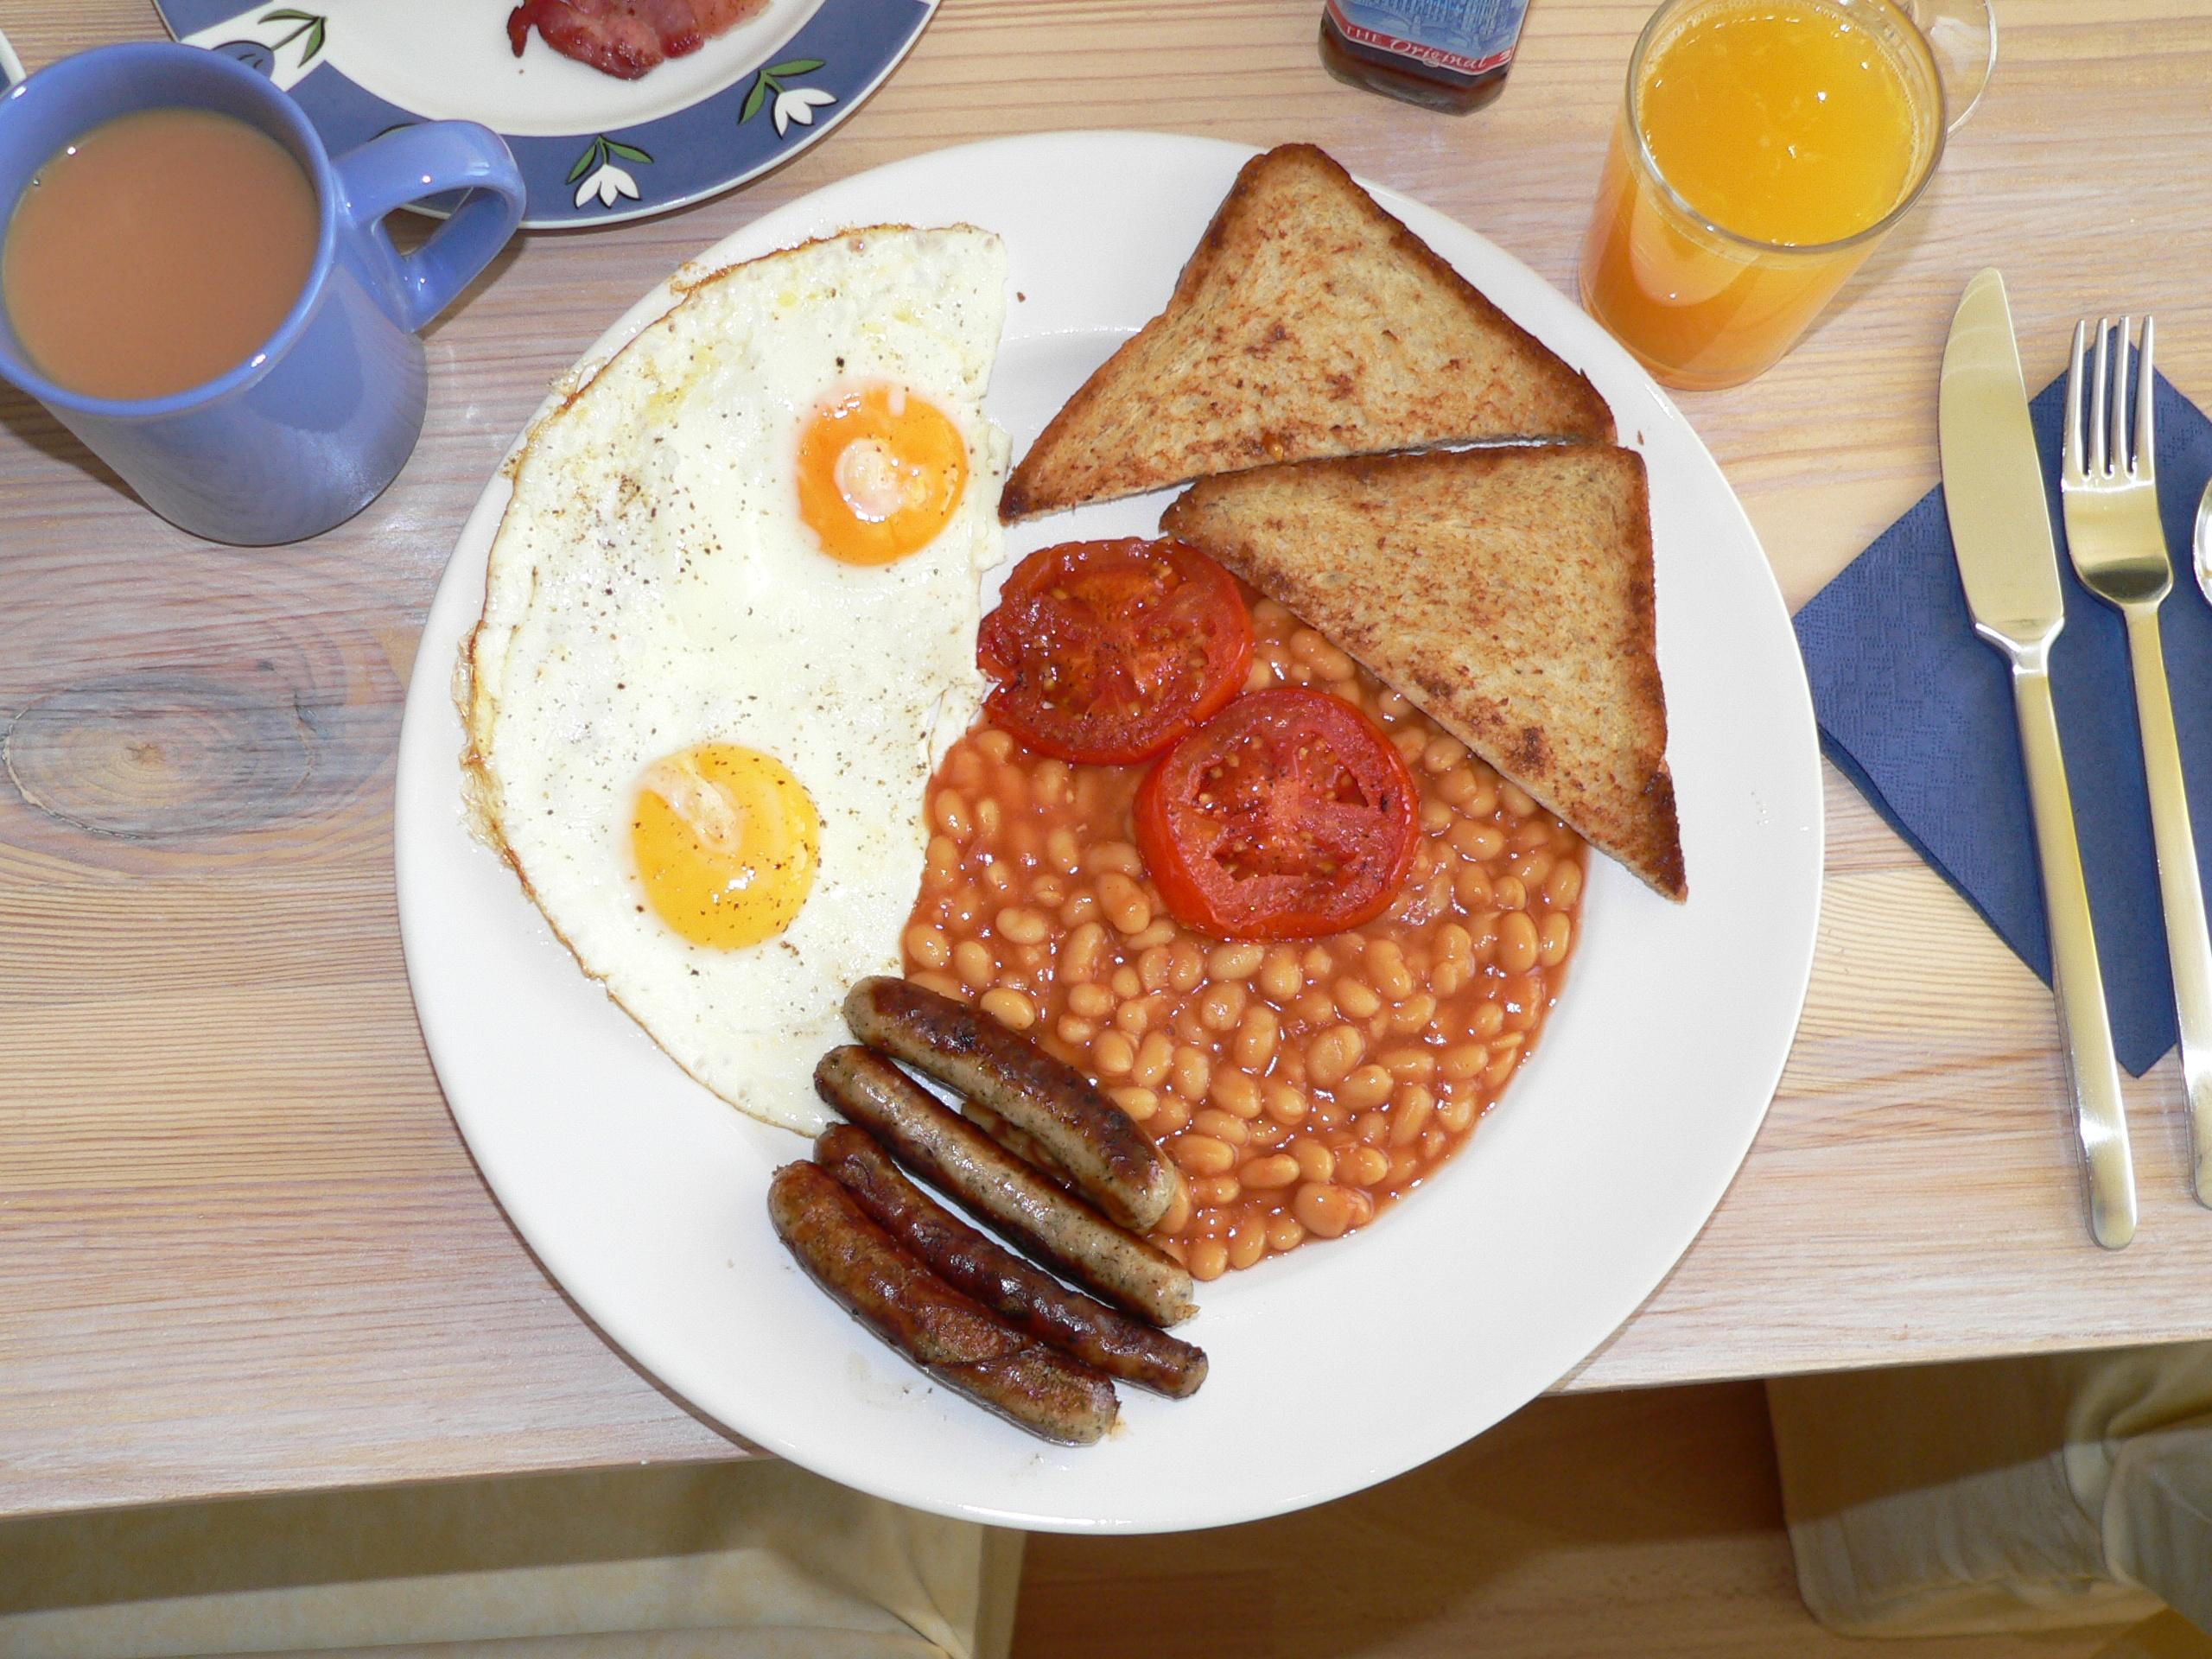 File:English Breakfast.jpg - Wikimedia Commons